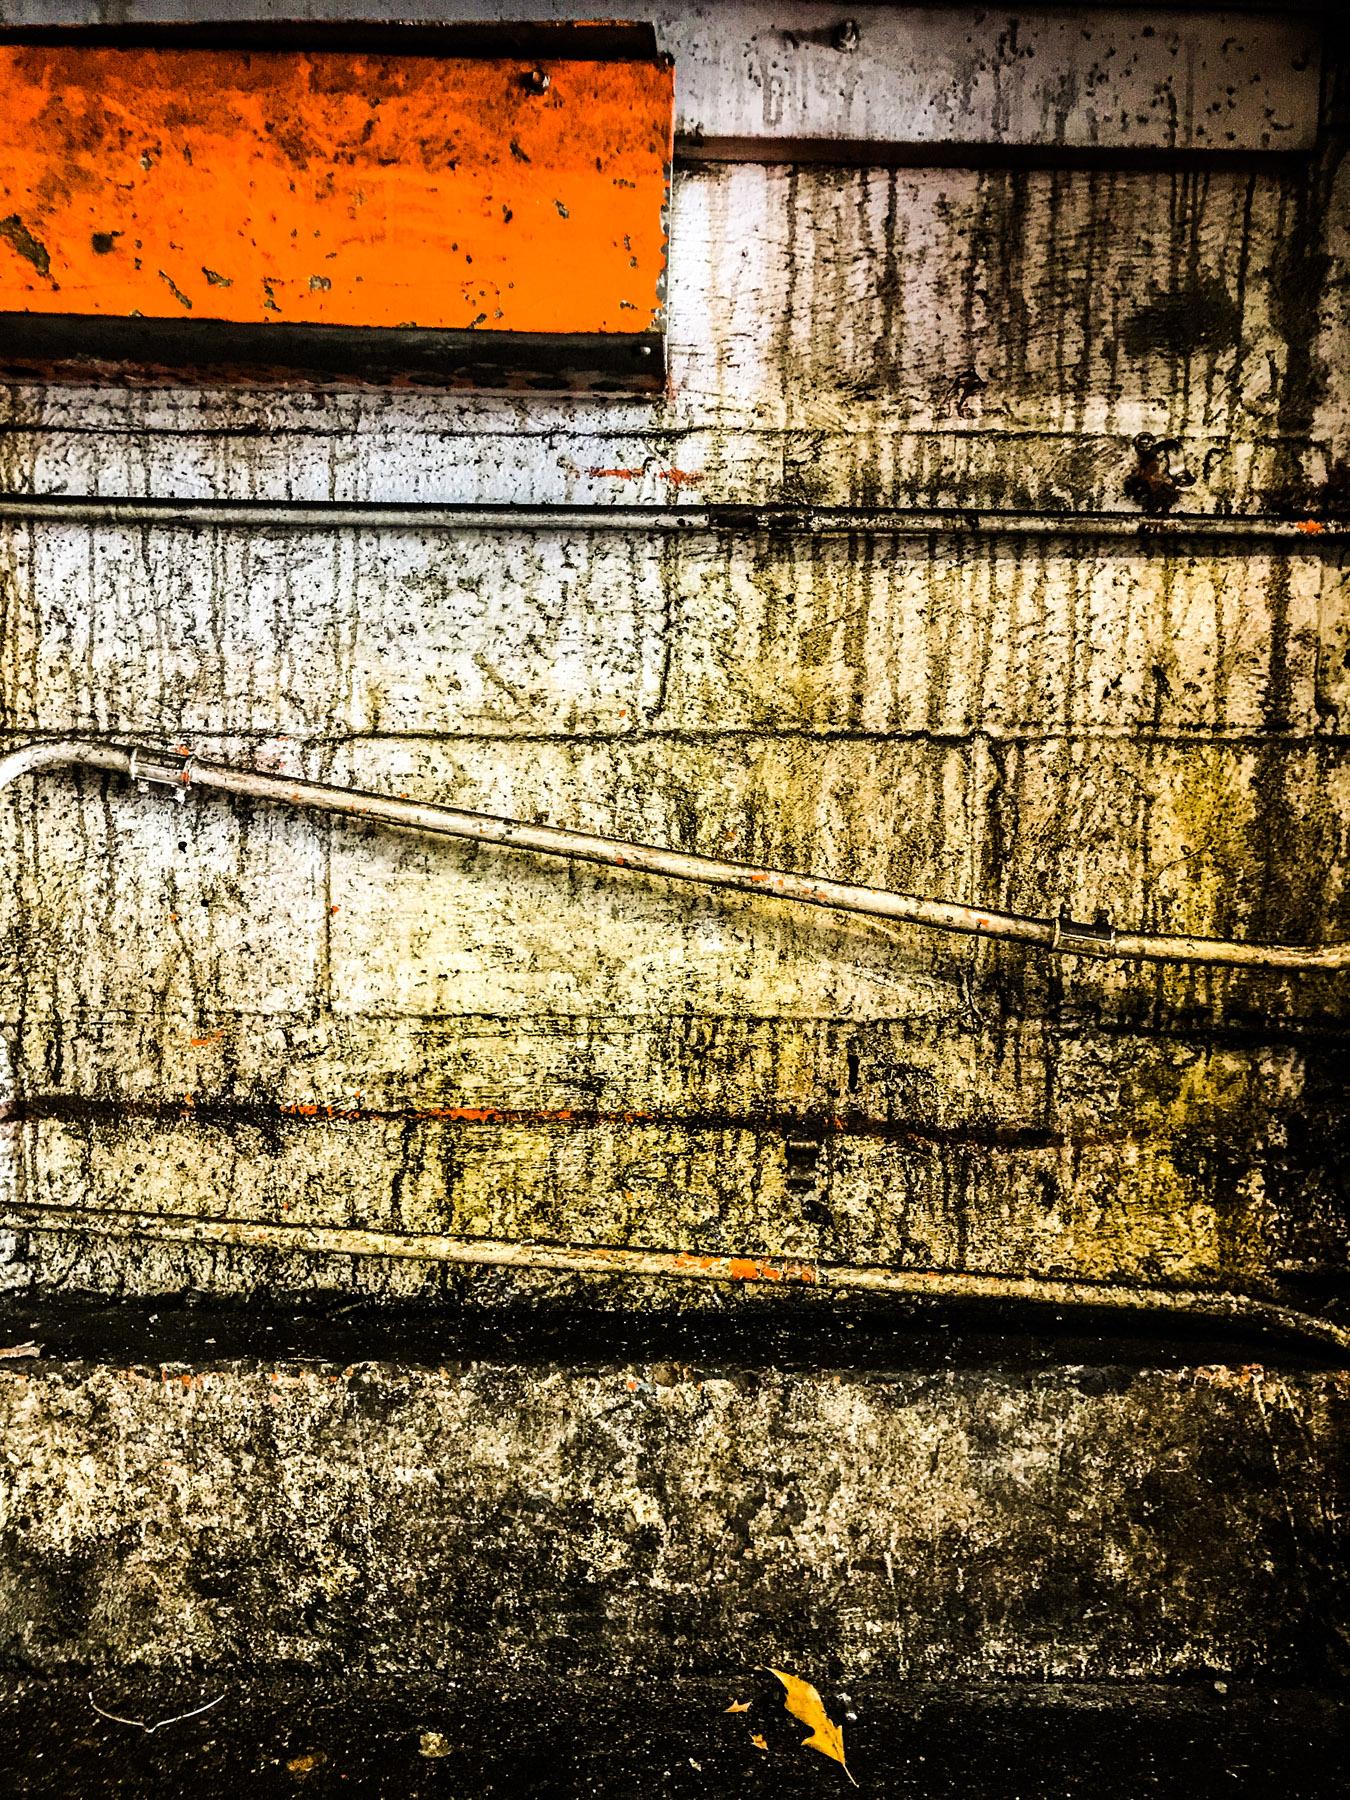 _Image©Eric_Michael_Pearson_TEXTURE_IMG_5319.jpg